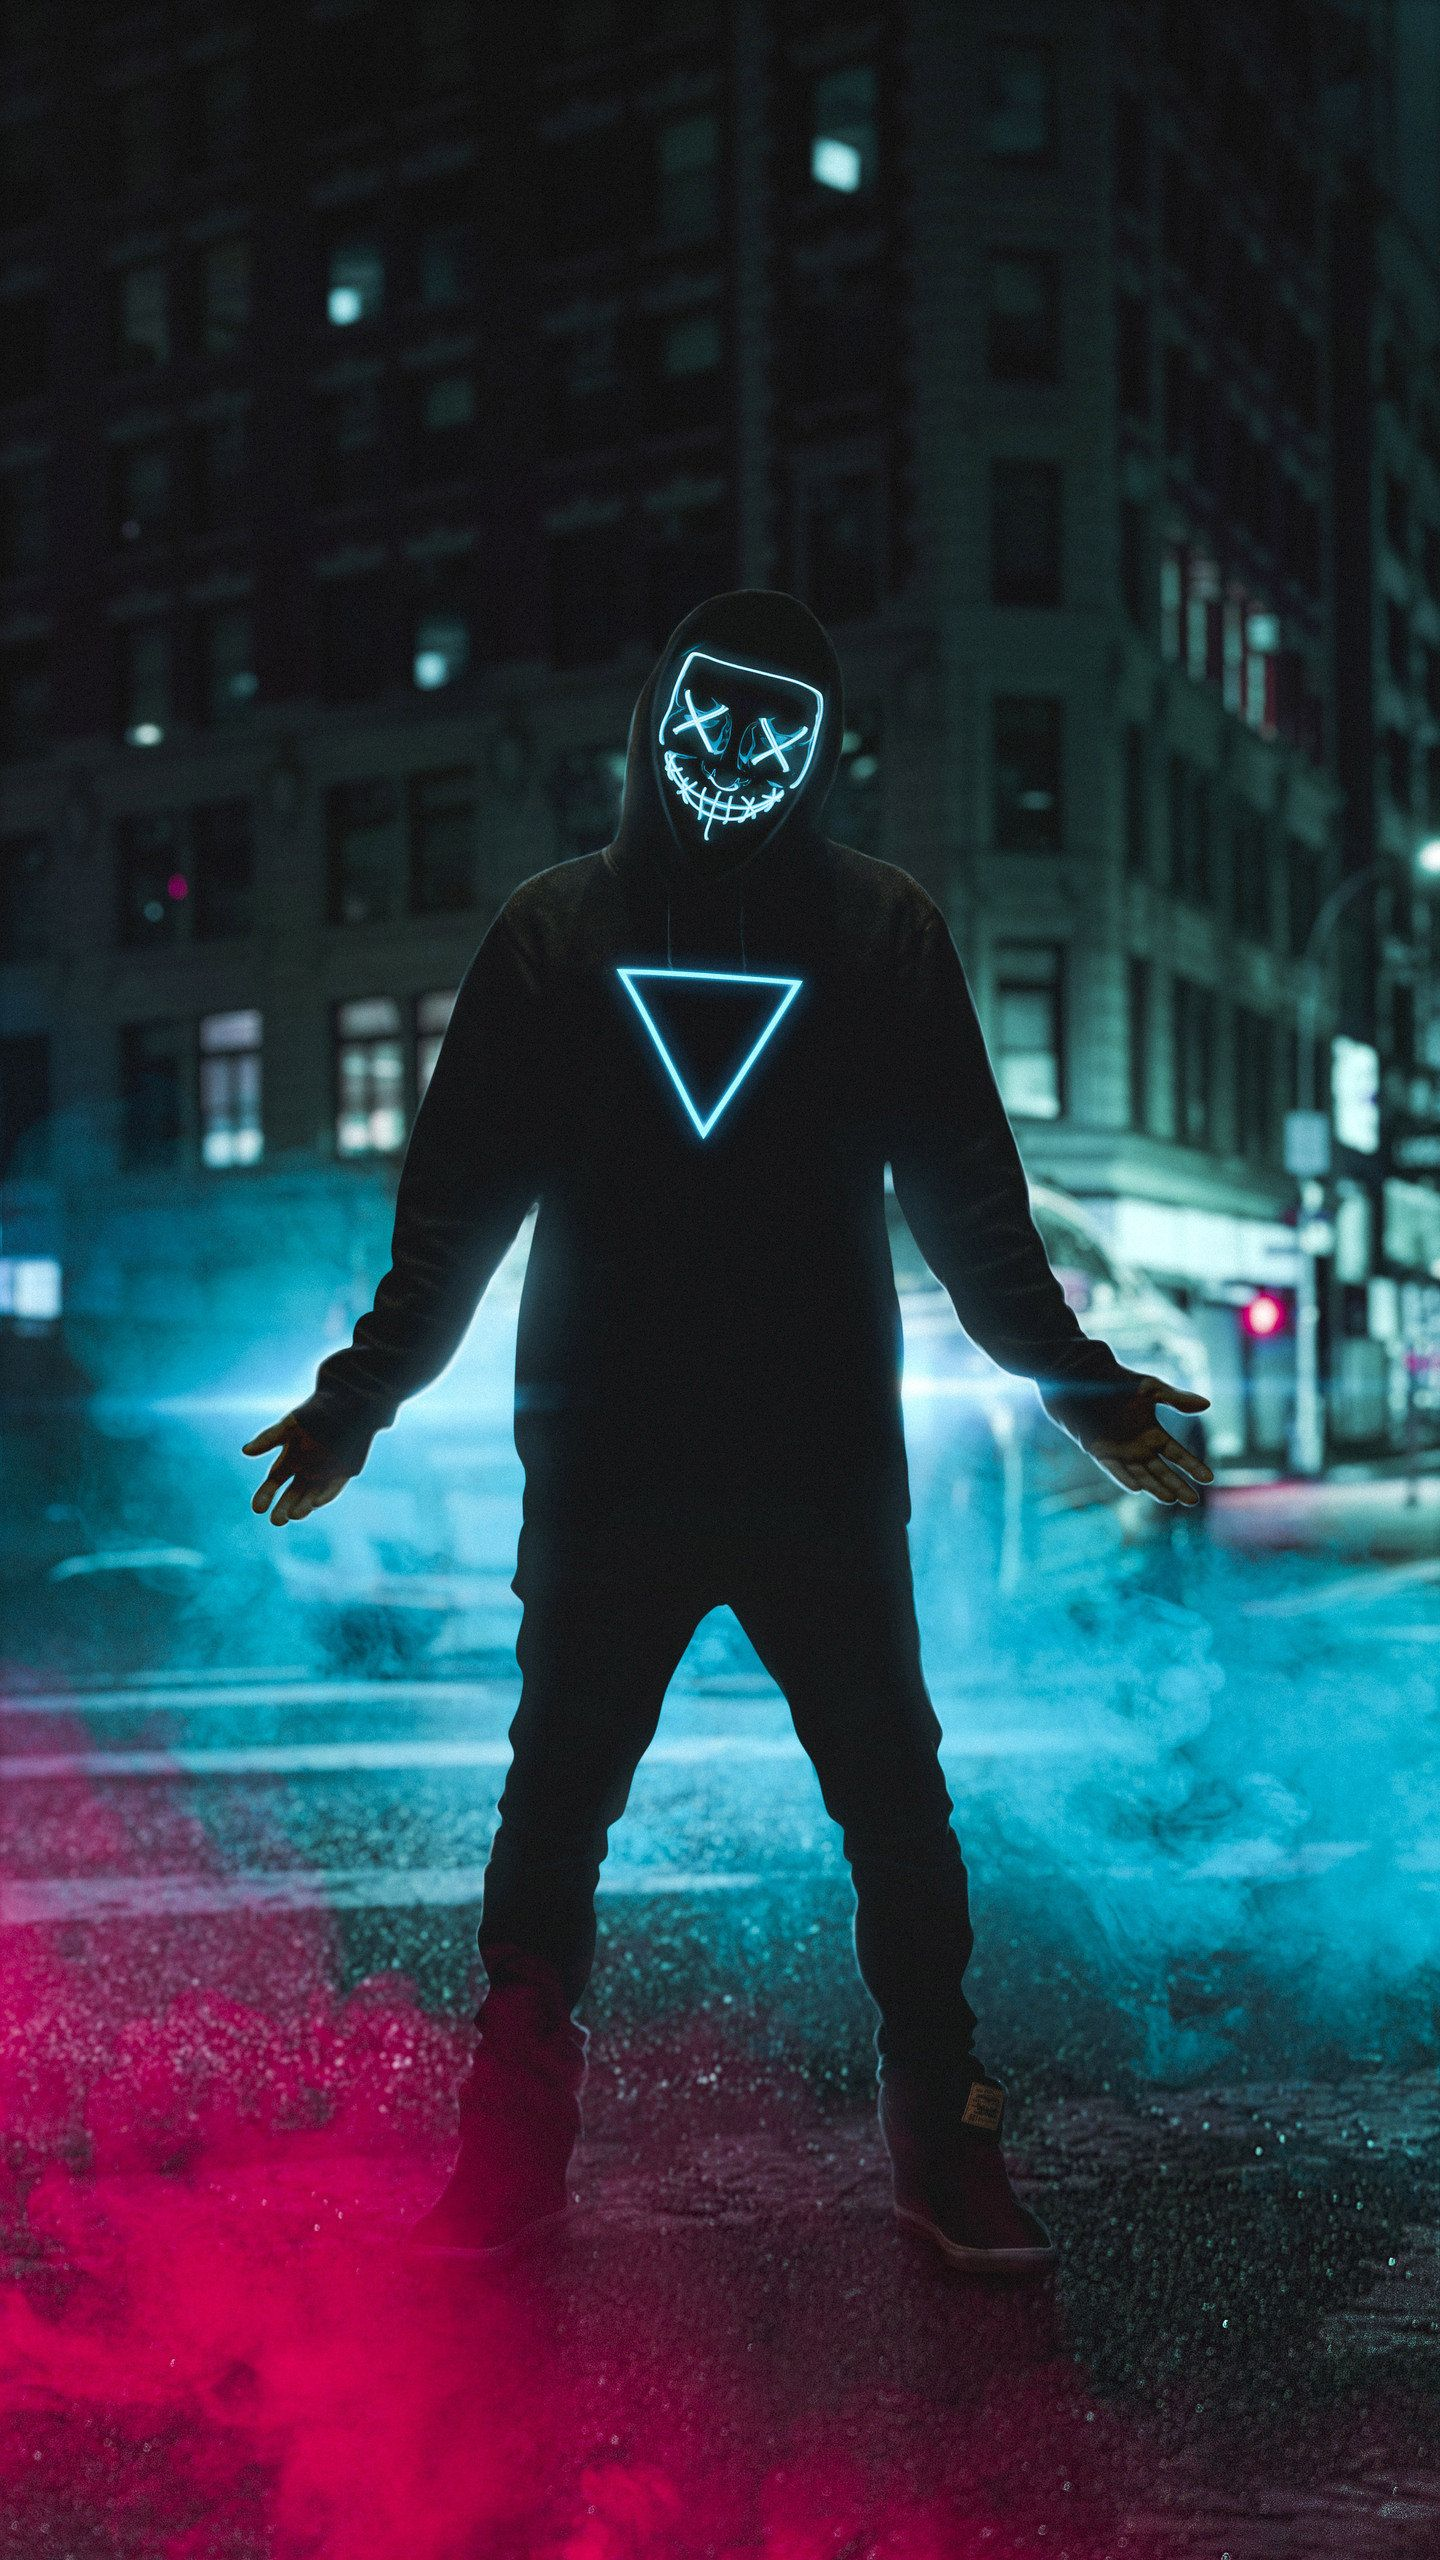 Neon Mask Boy 4k Hd Photography Wallpapers Photos And Pictures Em 2020 Fotografia Do Fumaca Papel De Parede Hd Papeis De Parede Hd Celular